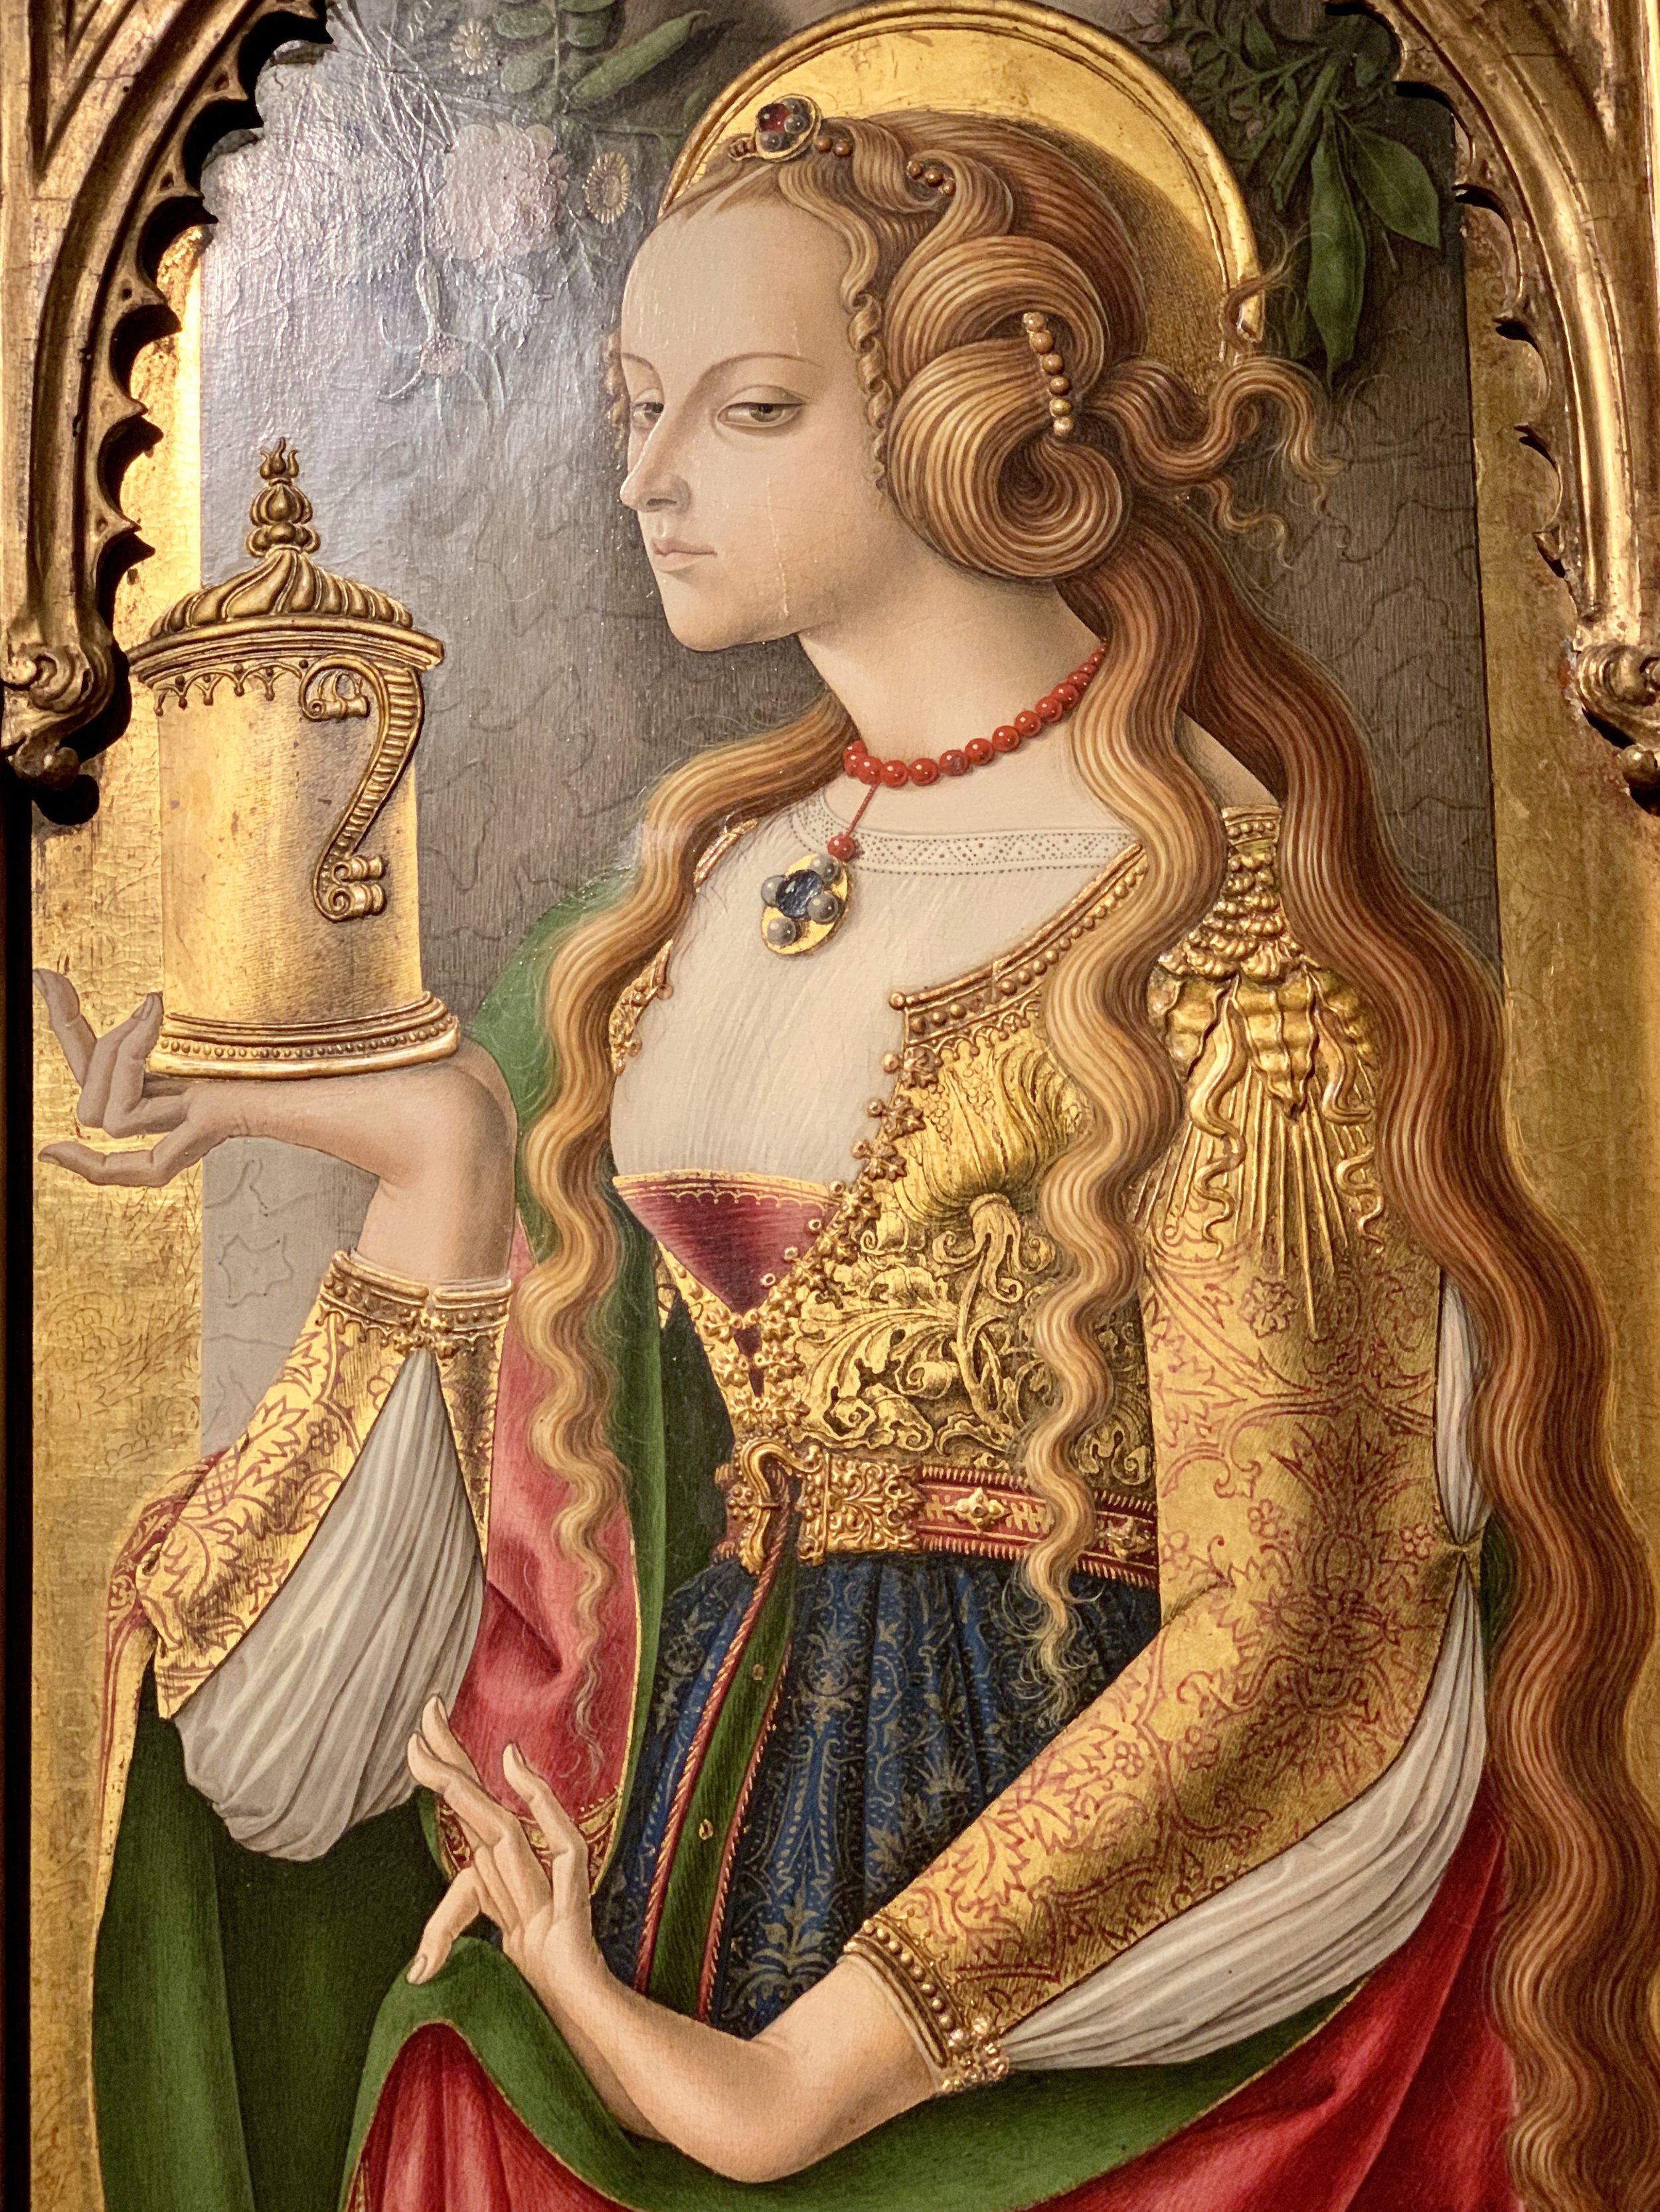 Carlo Crivelli's Mary Magdalene in the Rijksmuseum in Amsterdam.